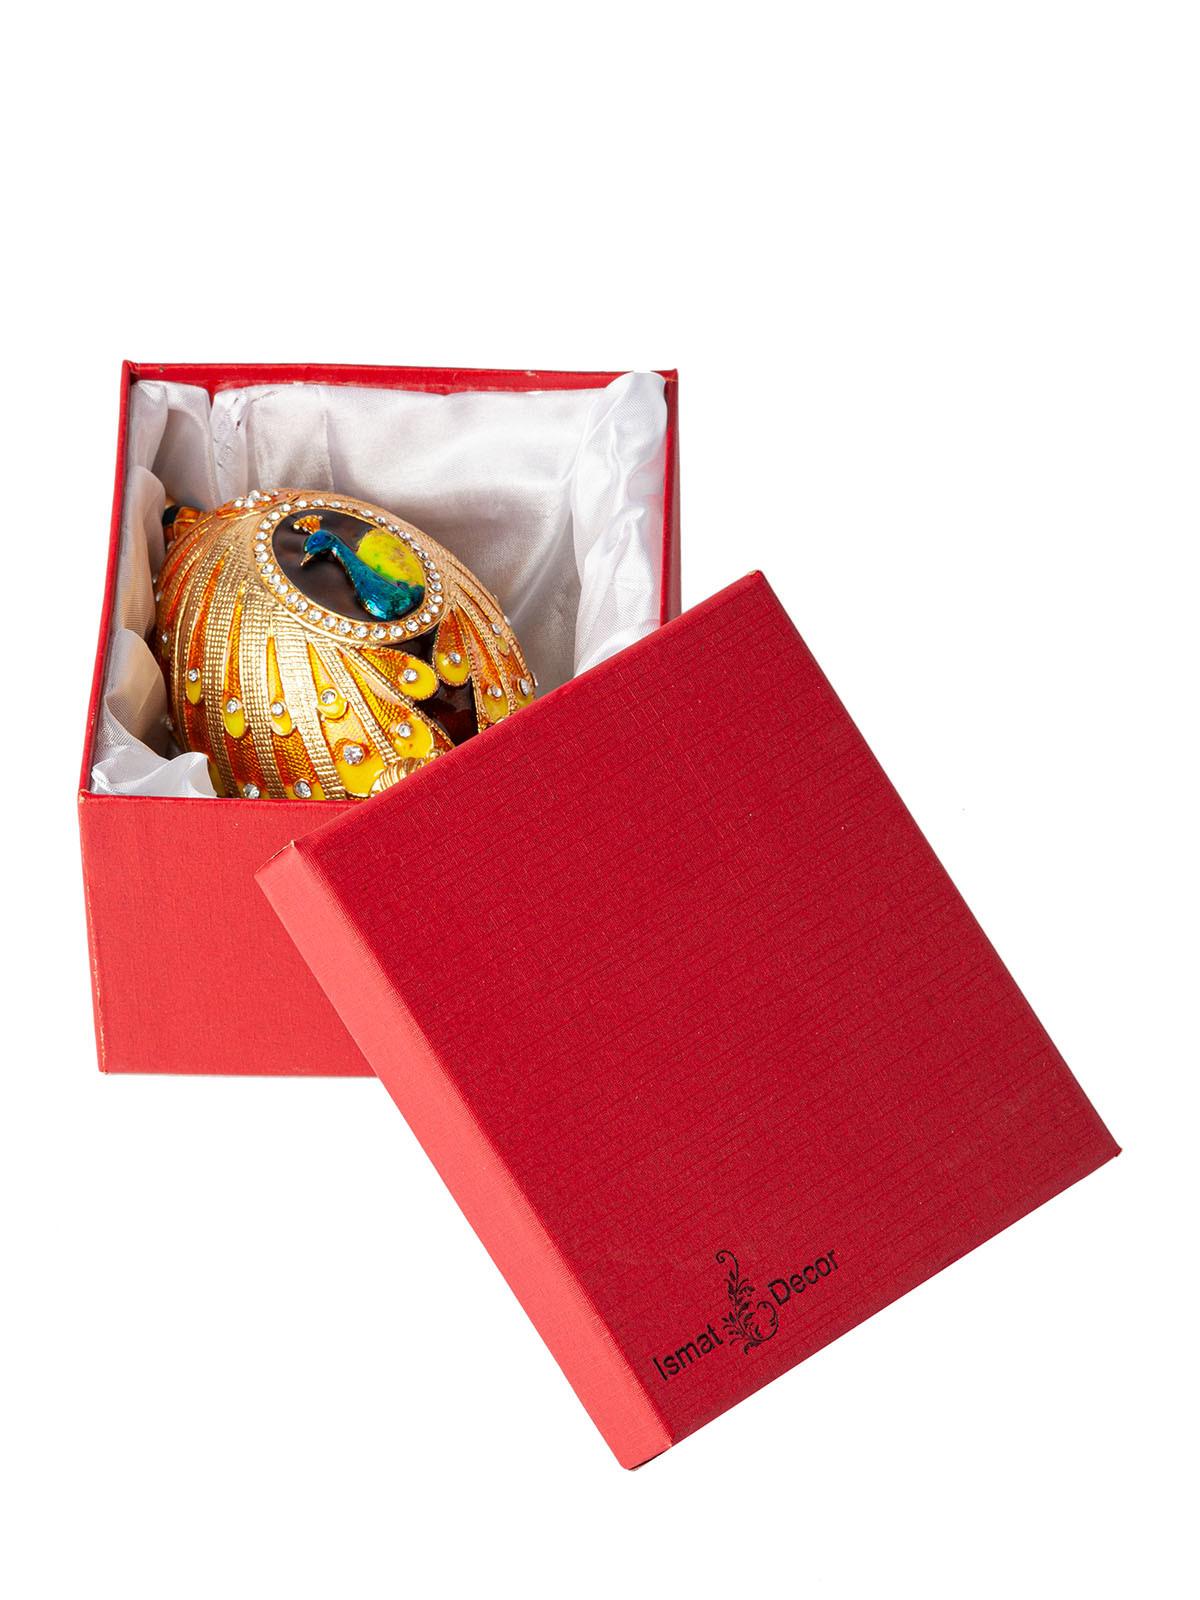 Металлическая шкатулка для украшений S-5300 желтый